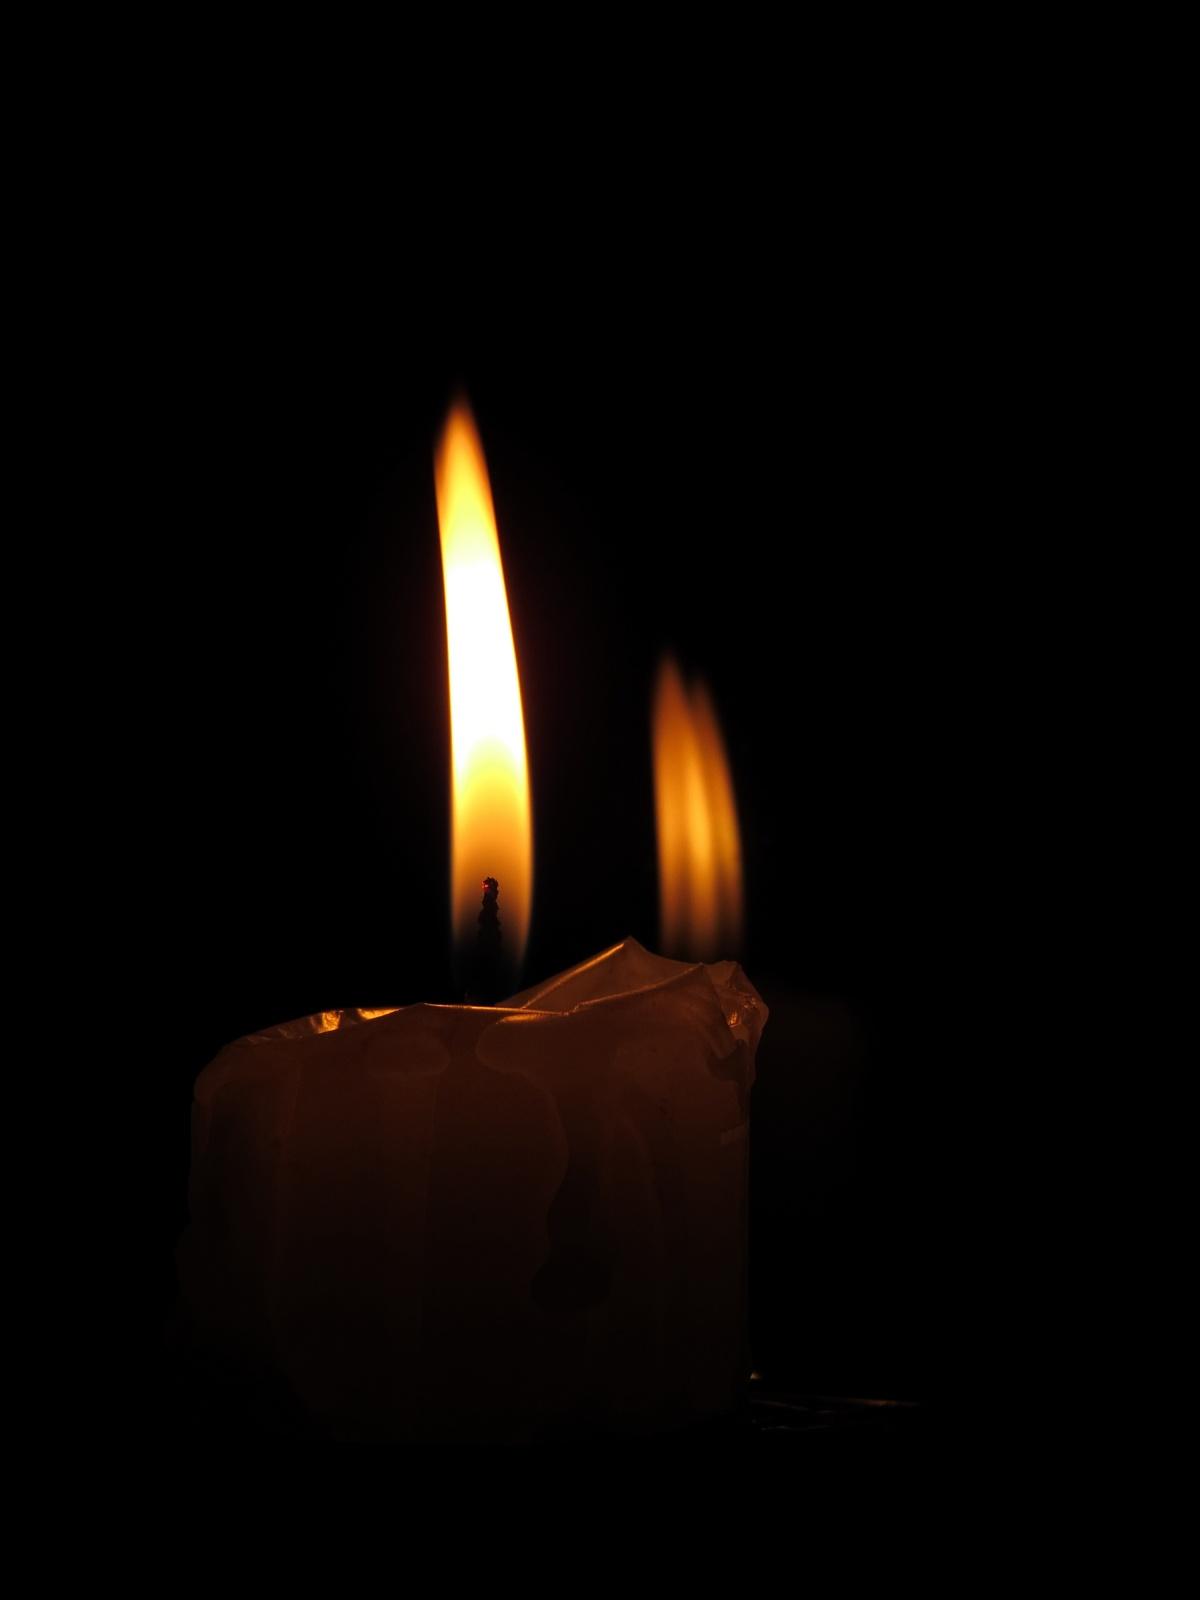 El fulgor de la quema de velas